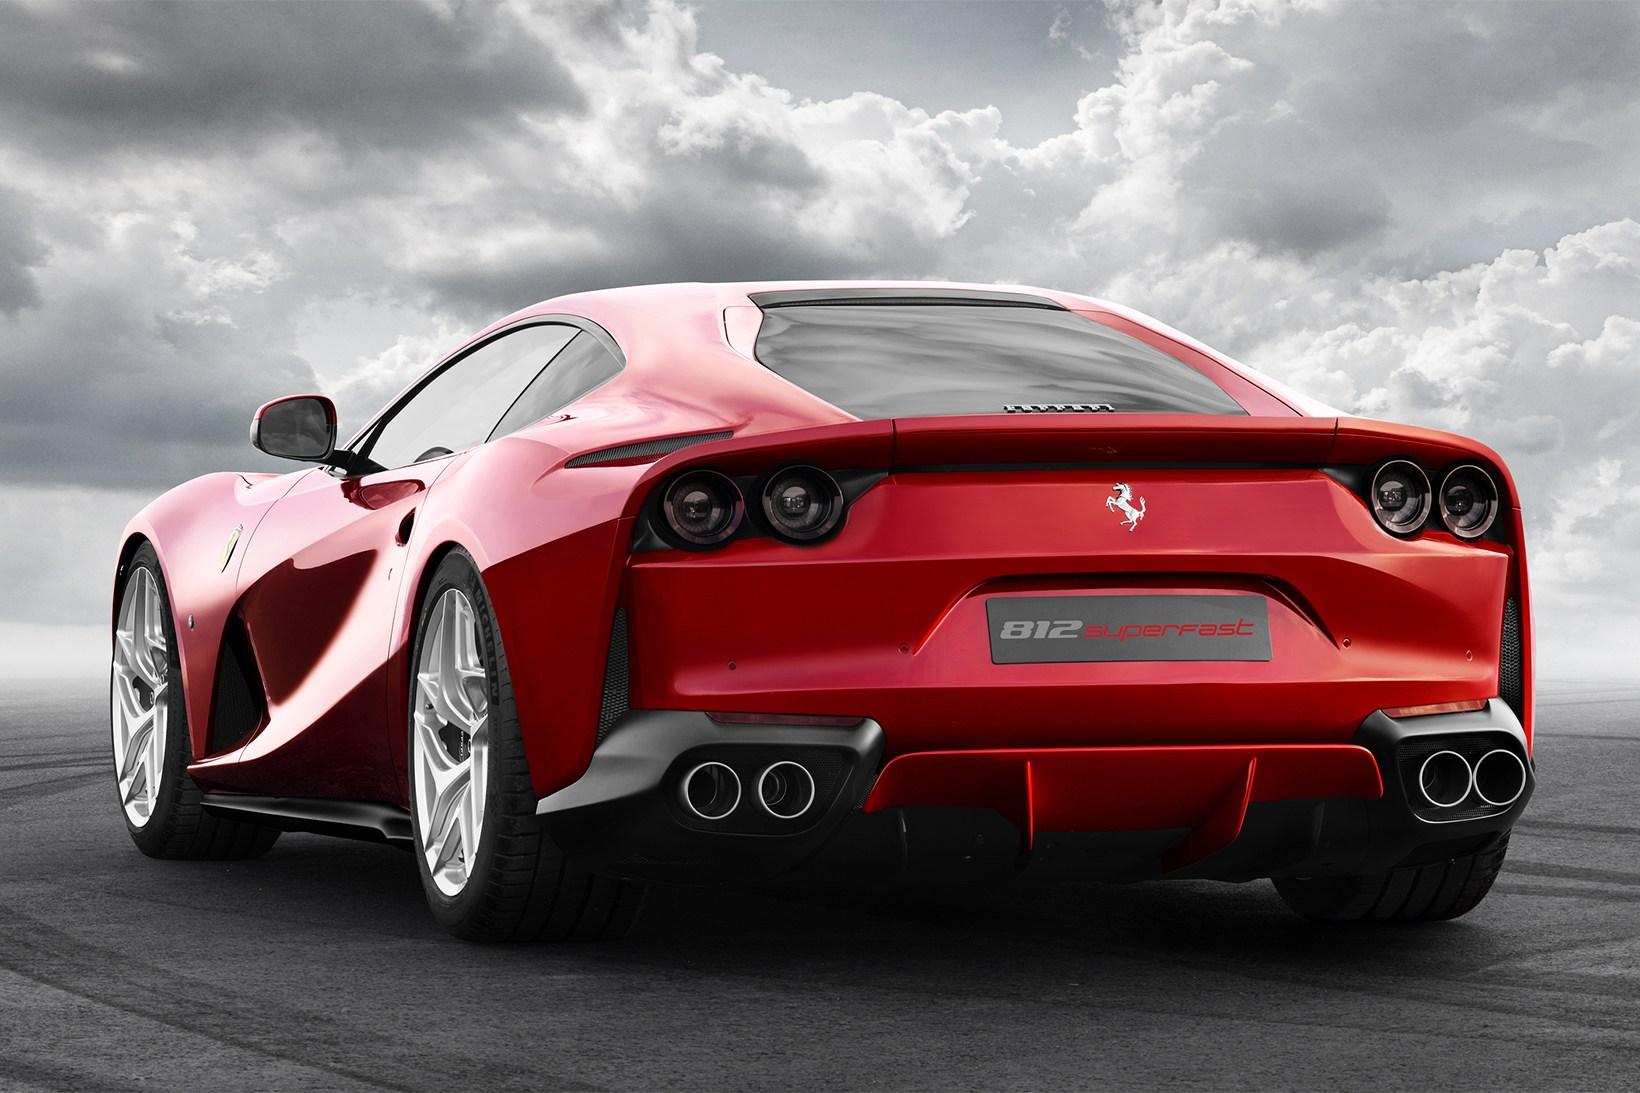 Ferrari 812 Superfast - 621126